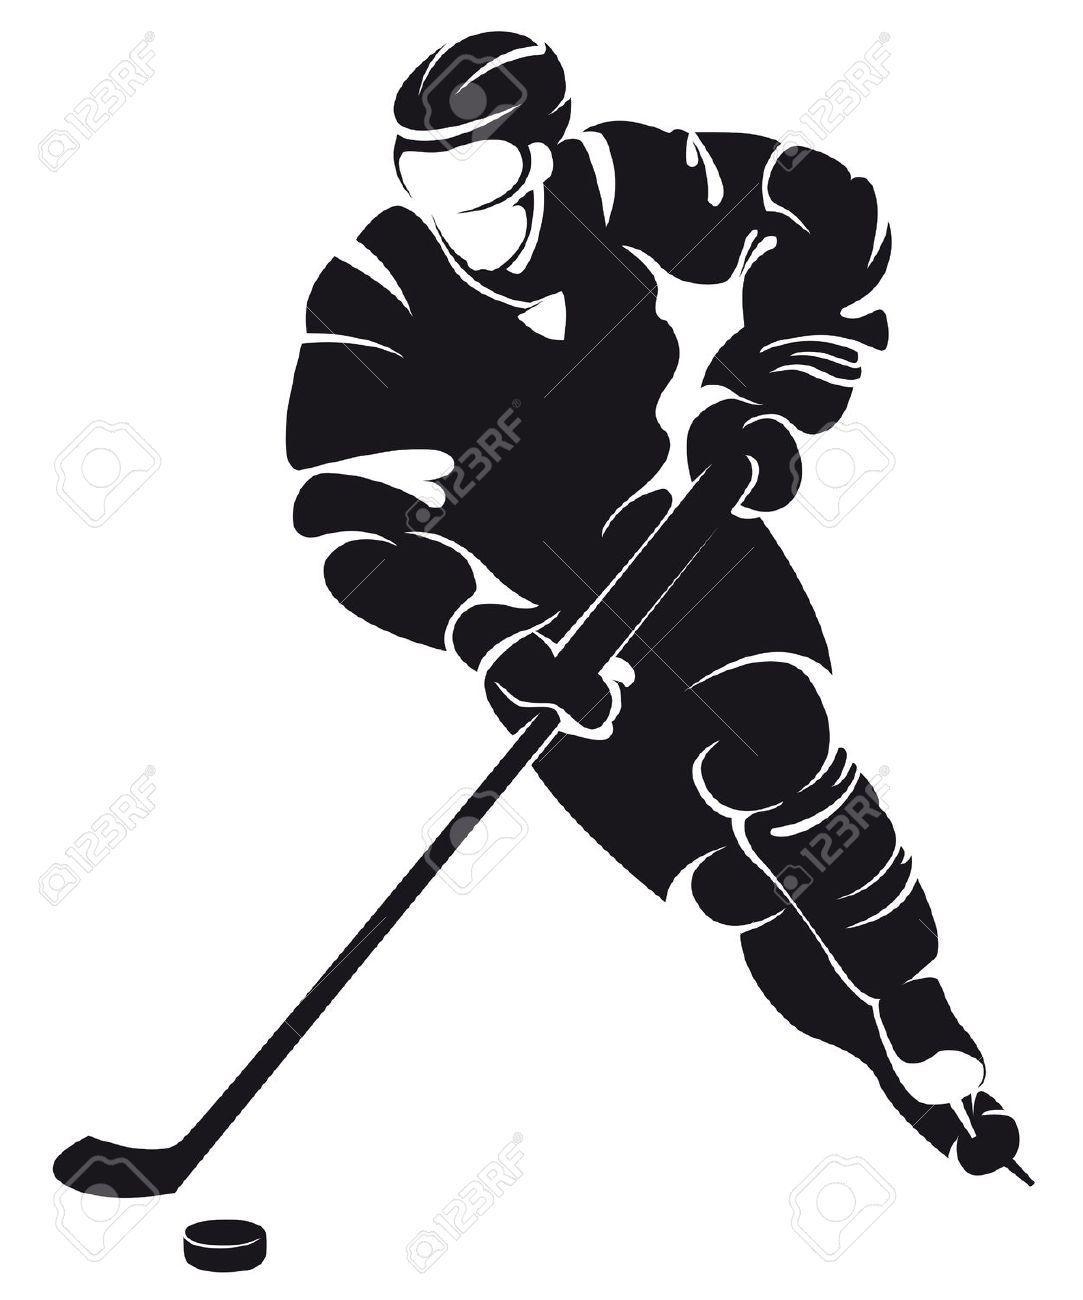 hockey clipart vector free clipartfest [ 1083 x 1300 Pixel ]